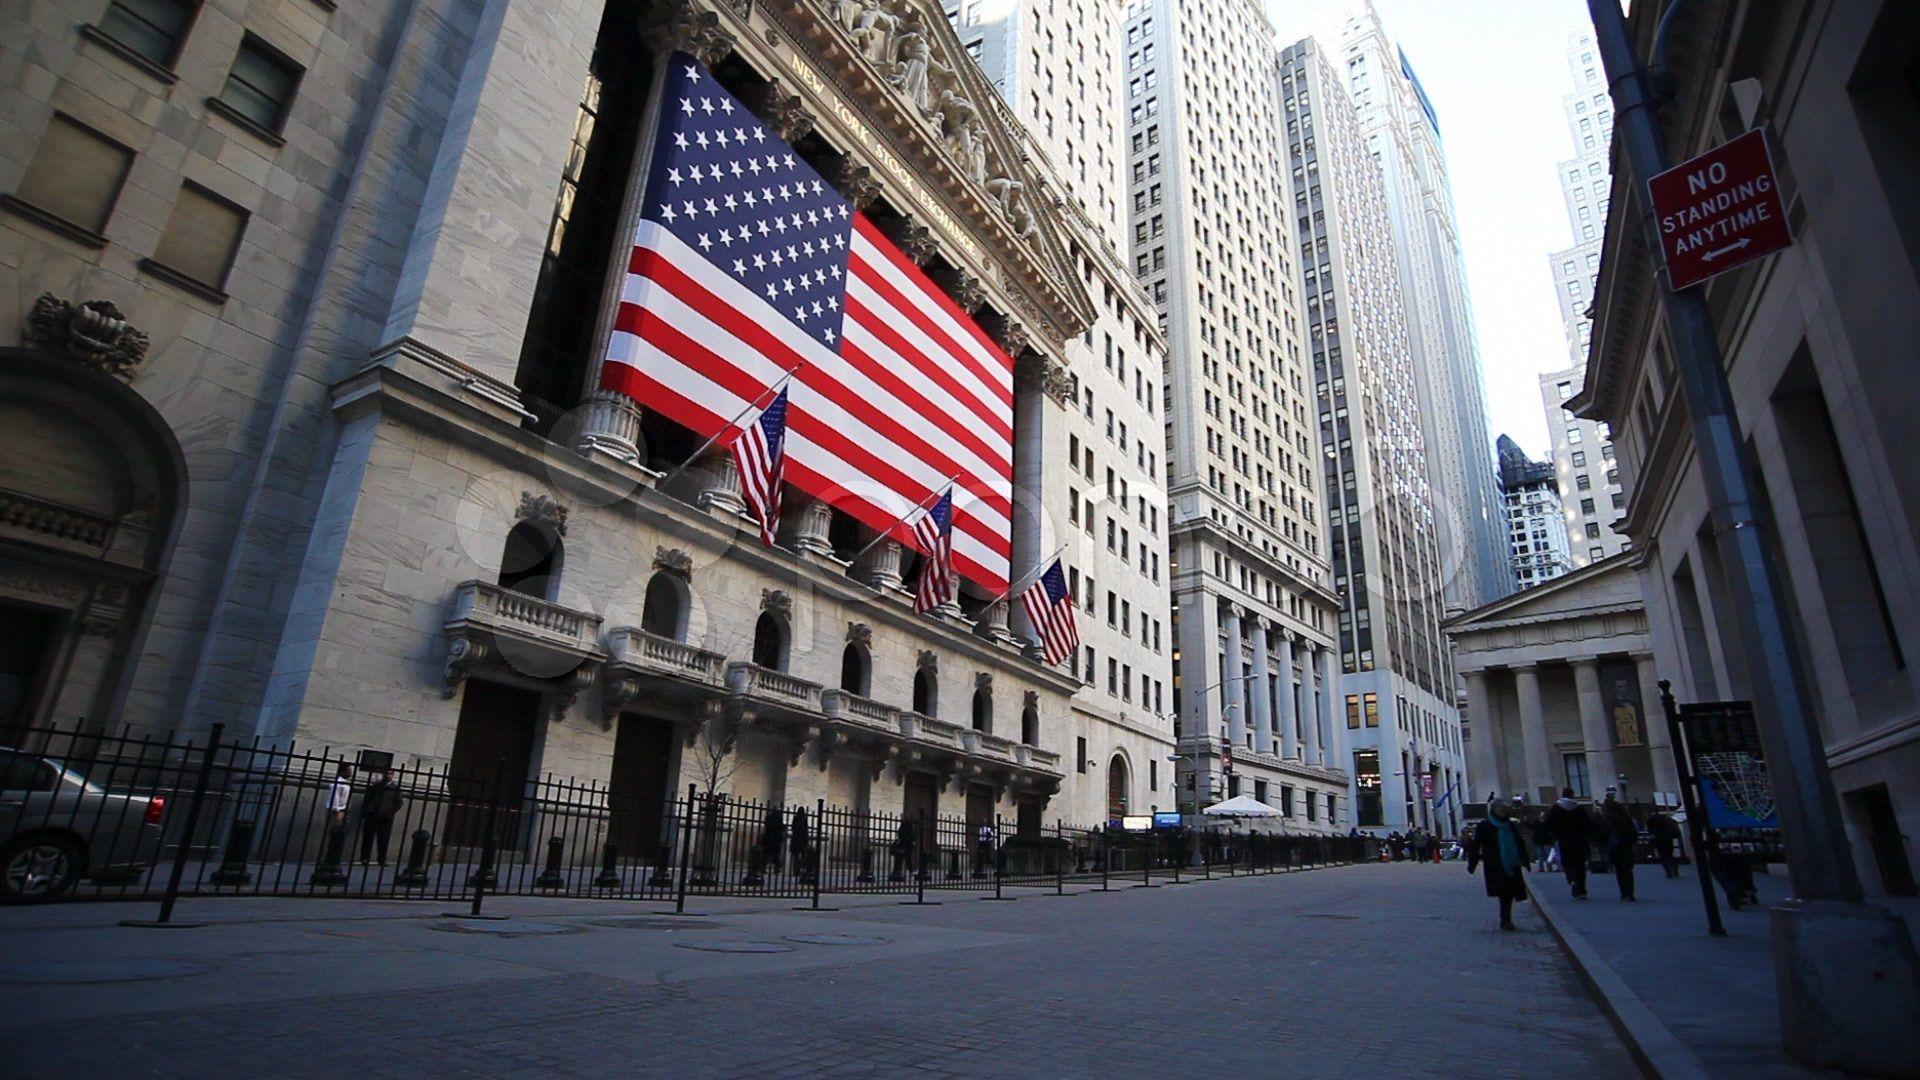 10 Top Wall Street Stock Market Wallpaper FULL HD 1920 ...